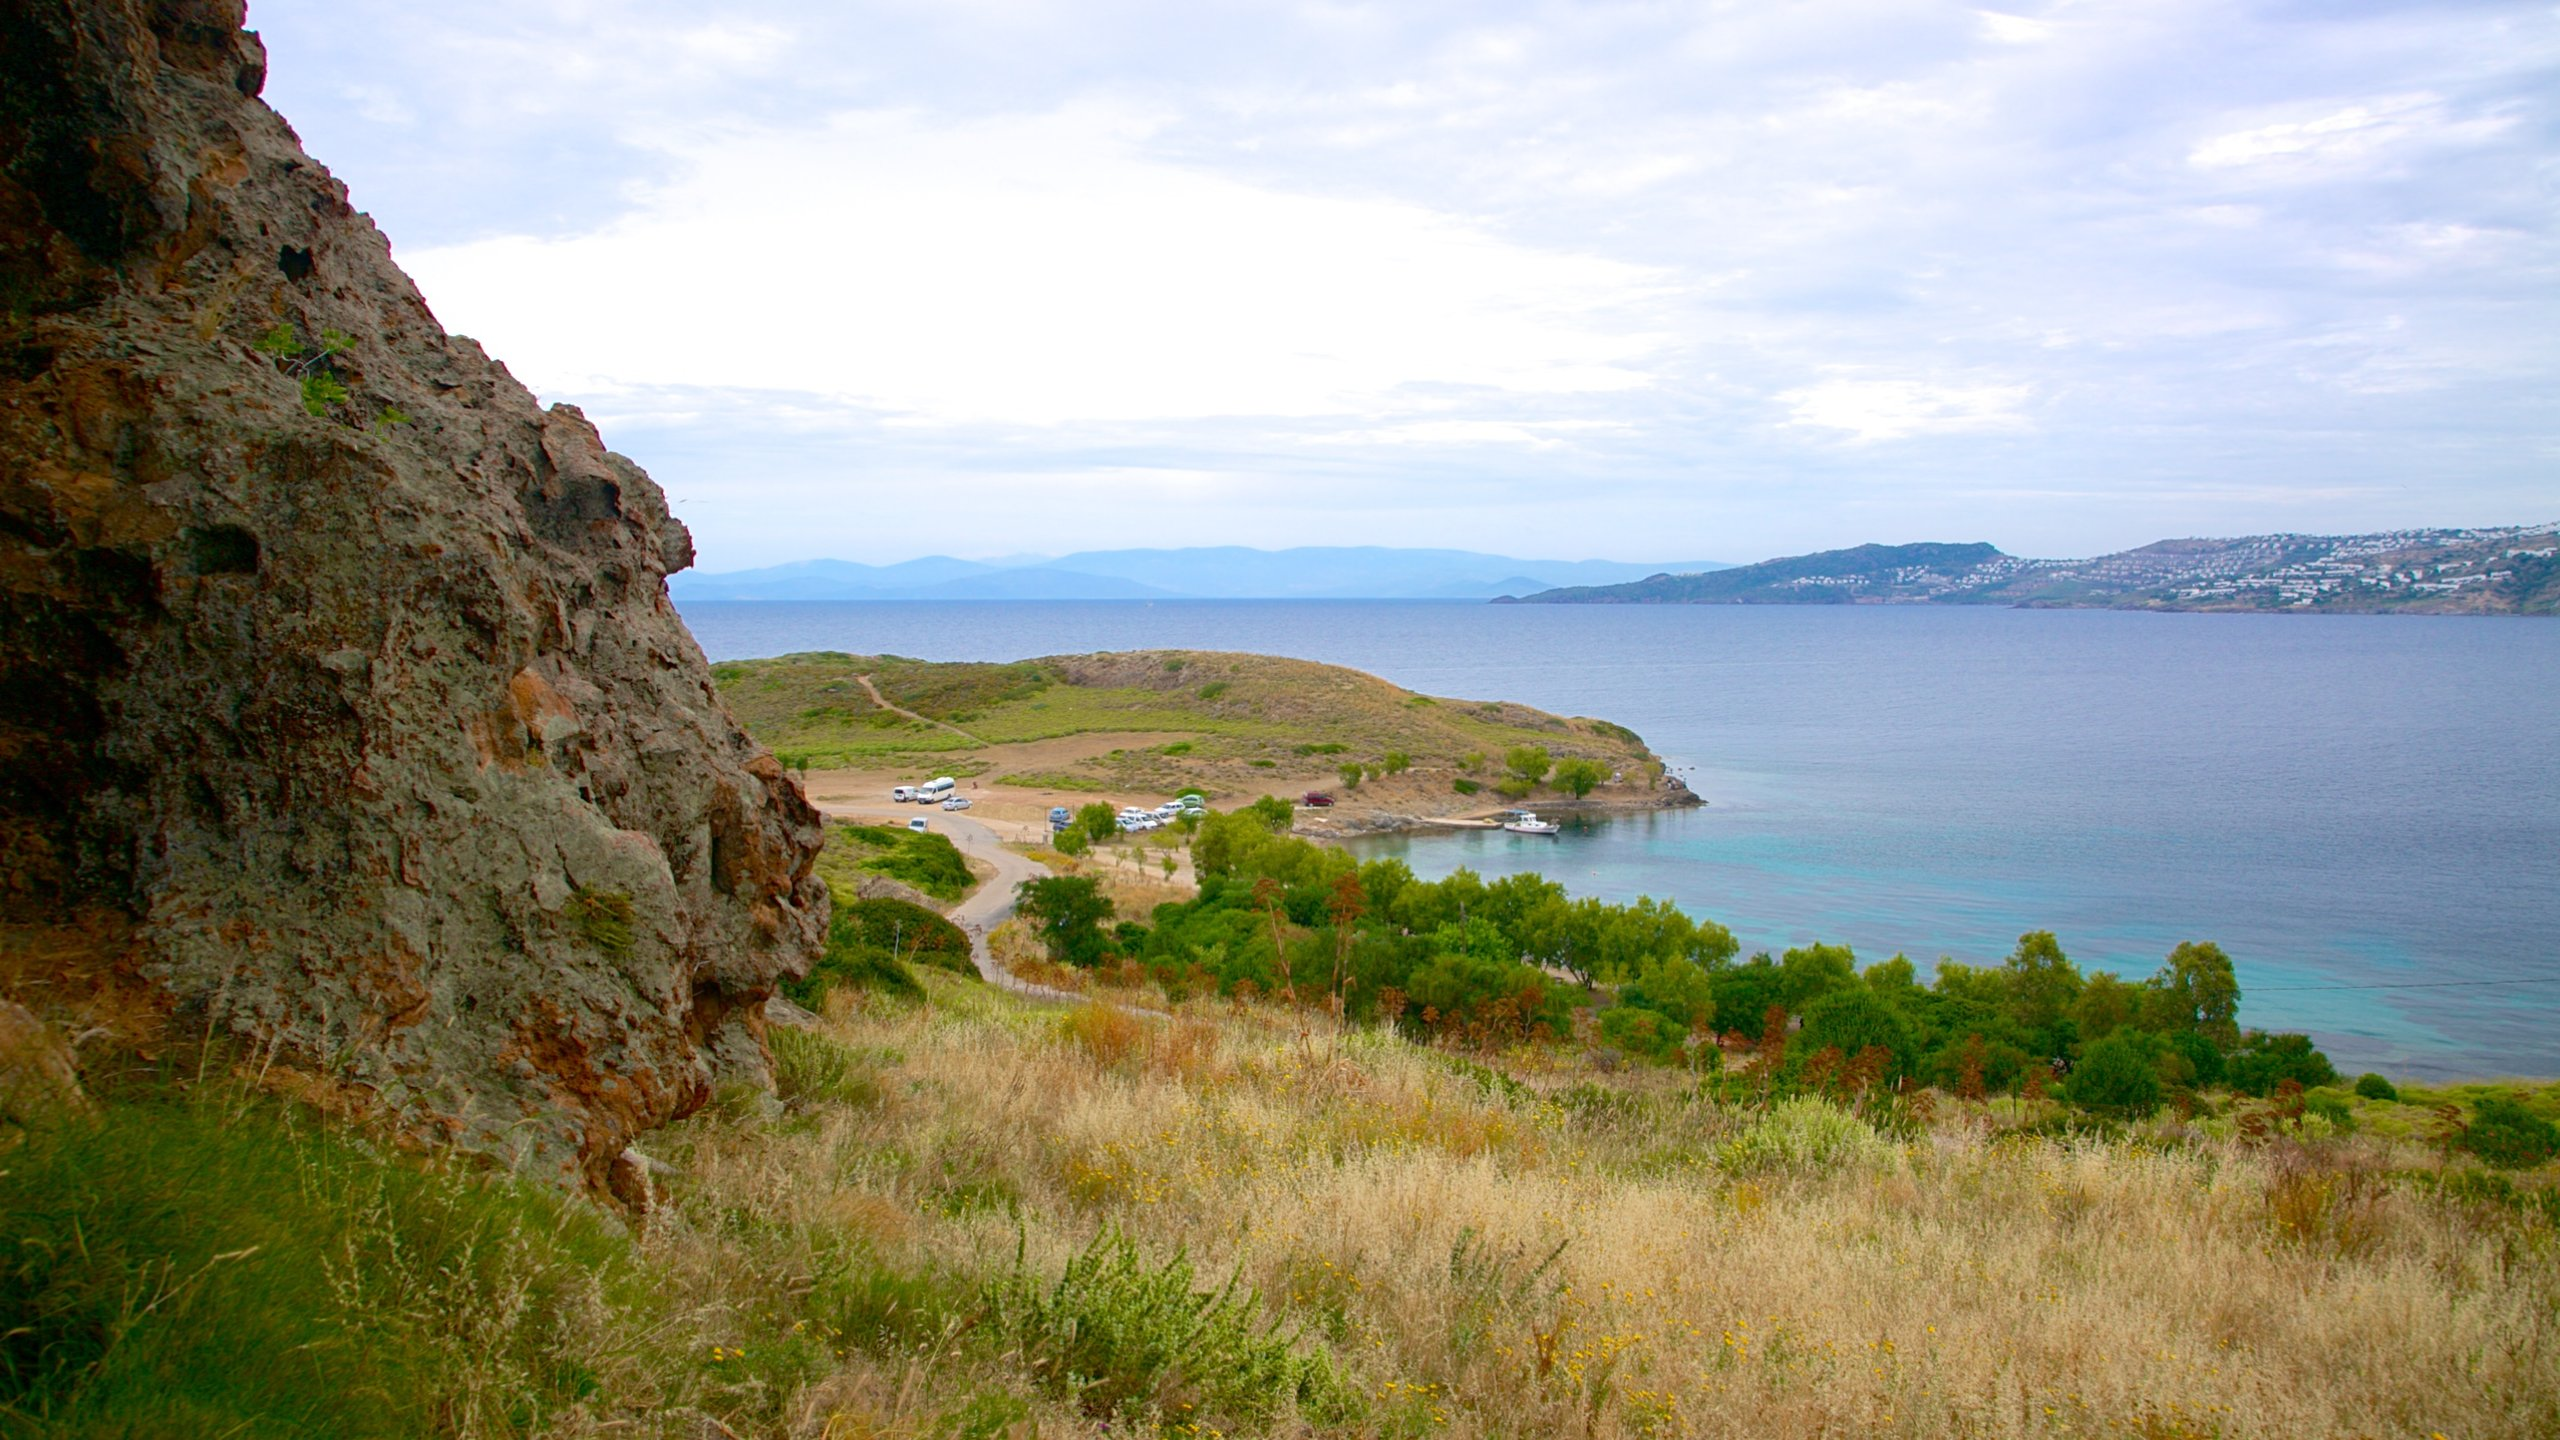 Yalikavak Beach, Bodrum, Mugla, Turkey